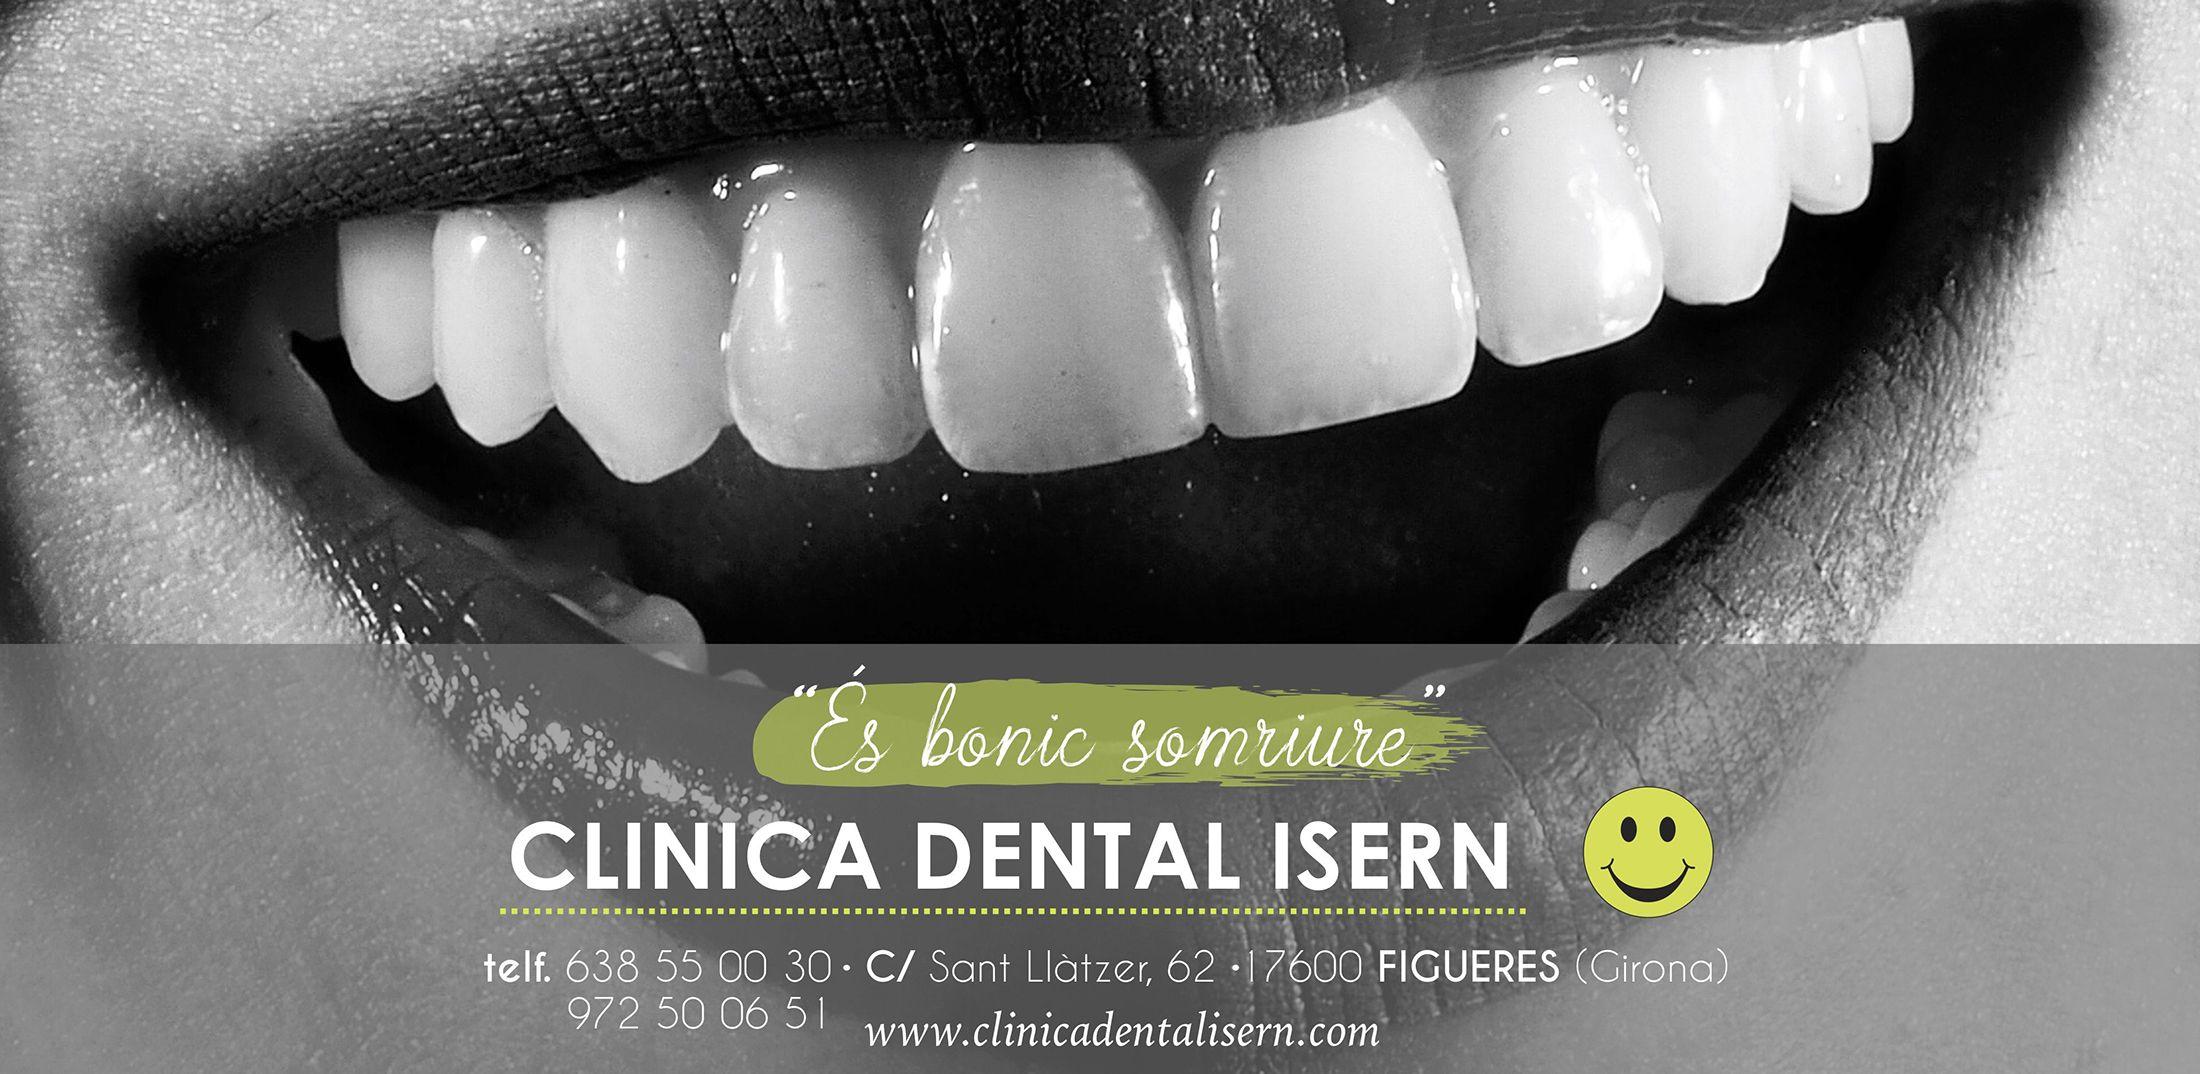 Clínica dental Isern - Portada